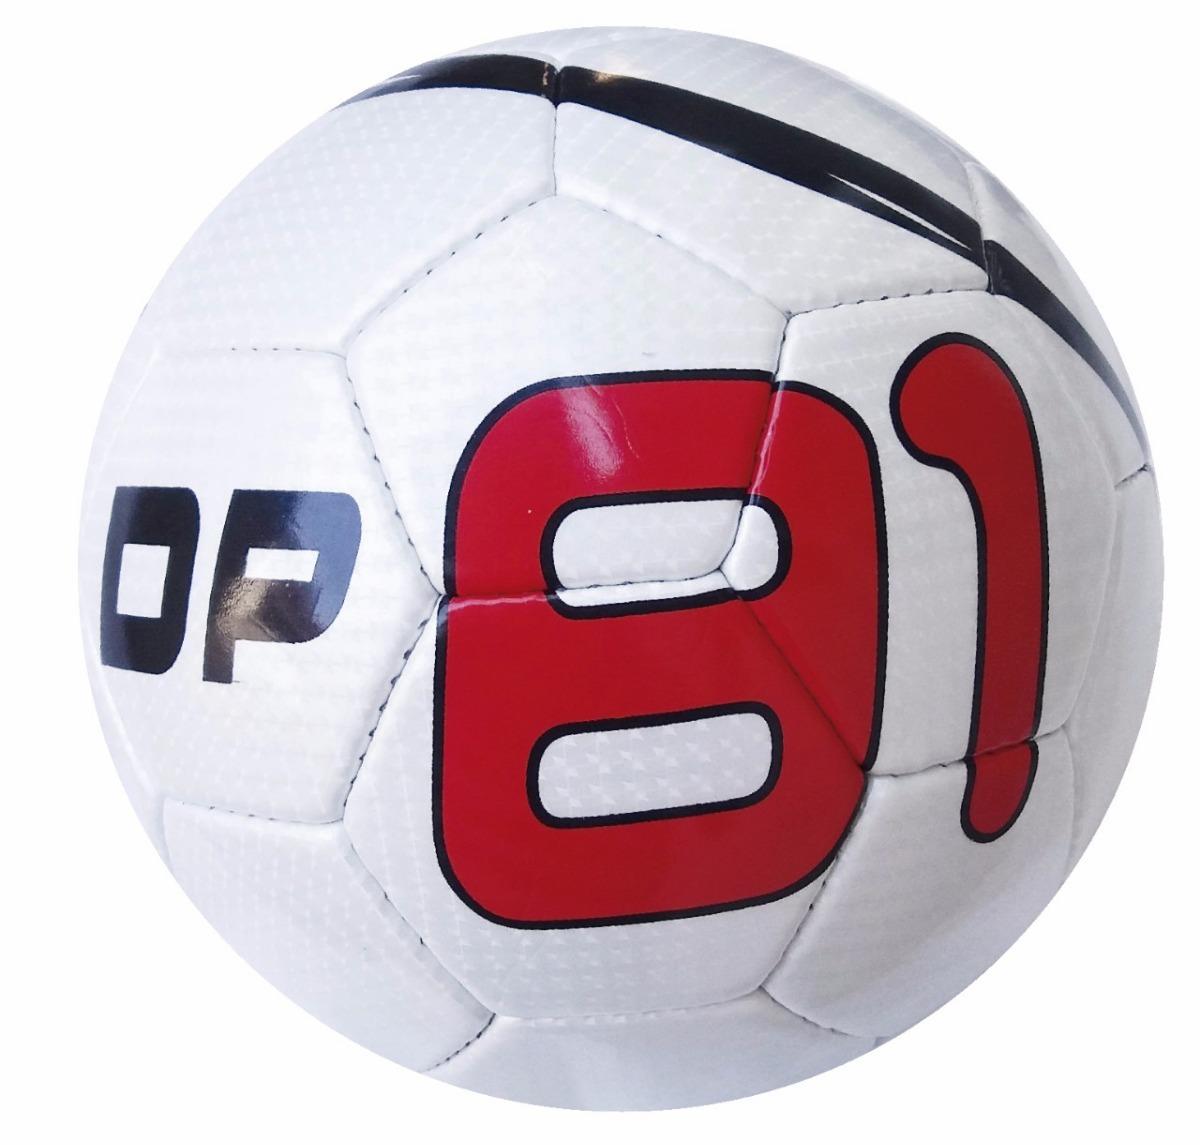 Kit Com 5 Bolas De Futsal 81 Cor Pérola 25% Desconto 2018 - R  285 ... d32faefa8443f